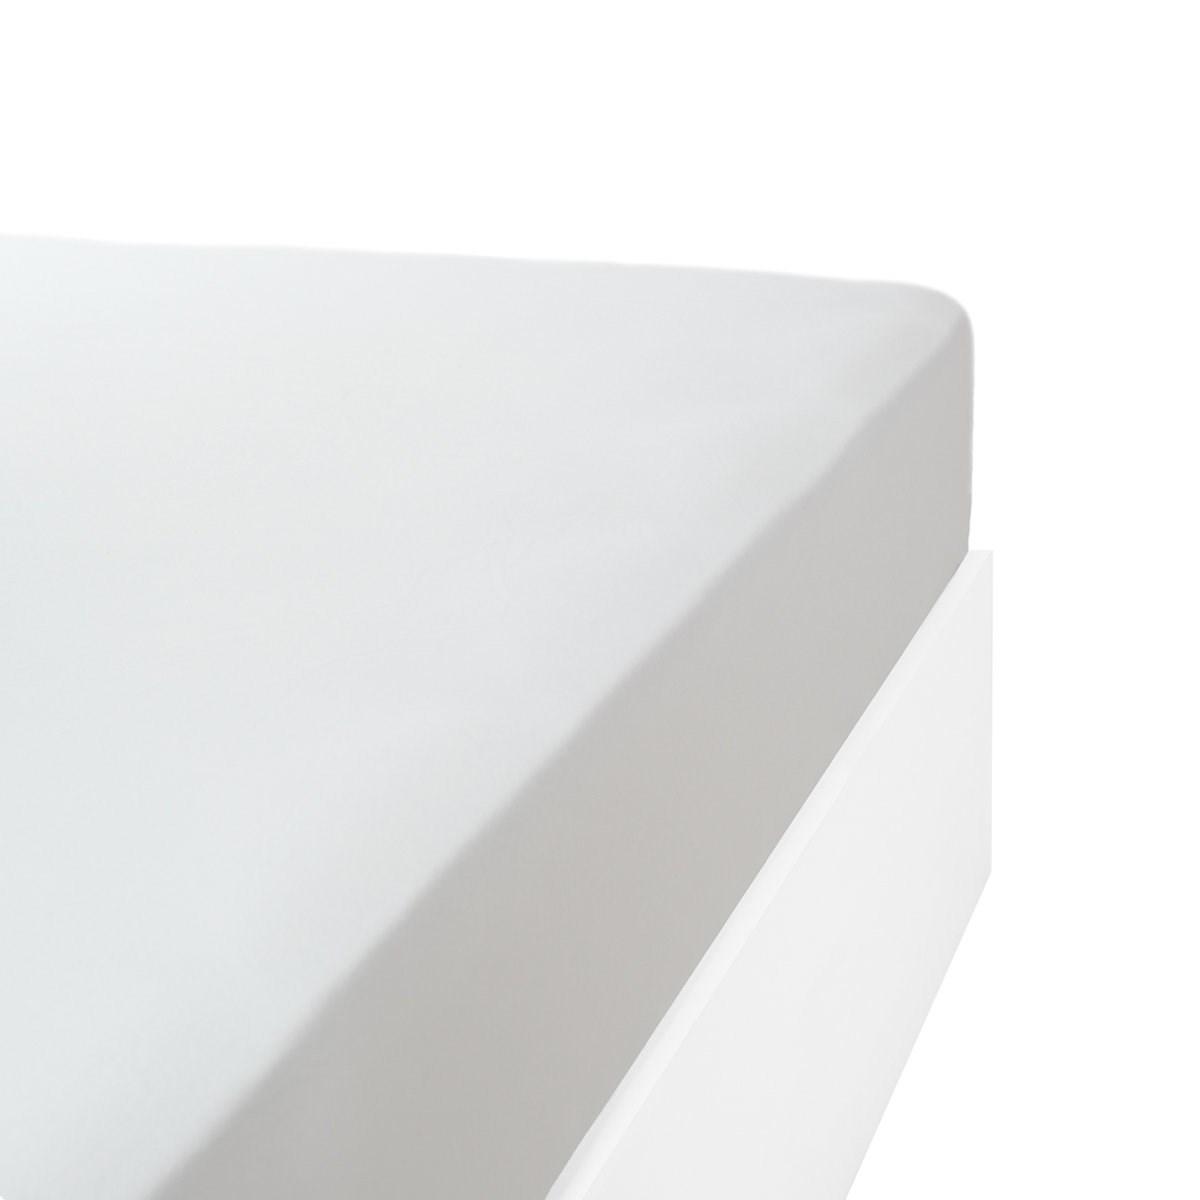 Drap housse jersey extensible en coton blanc 140x190 cm